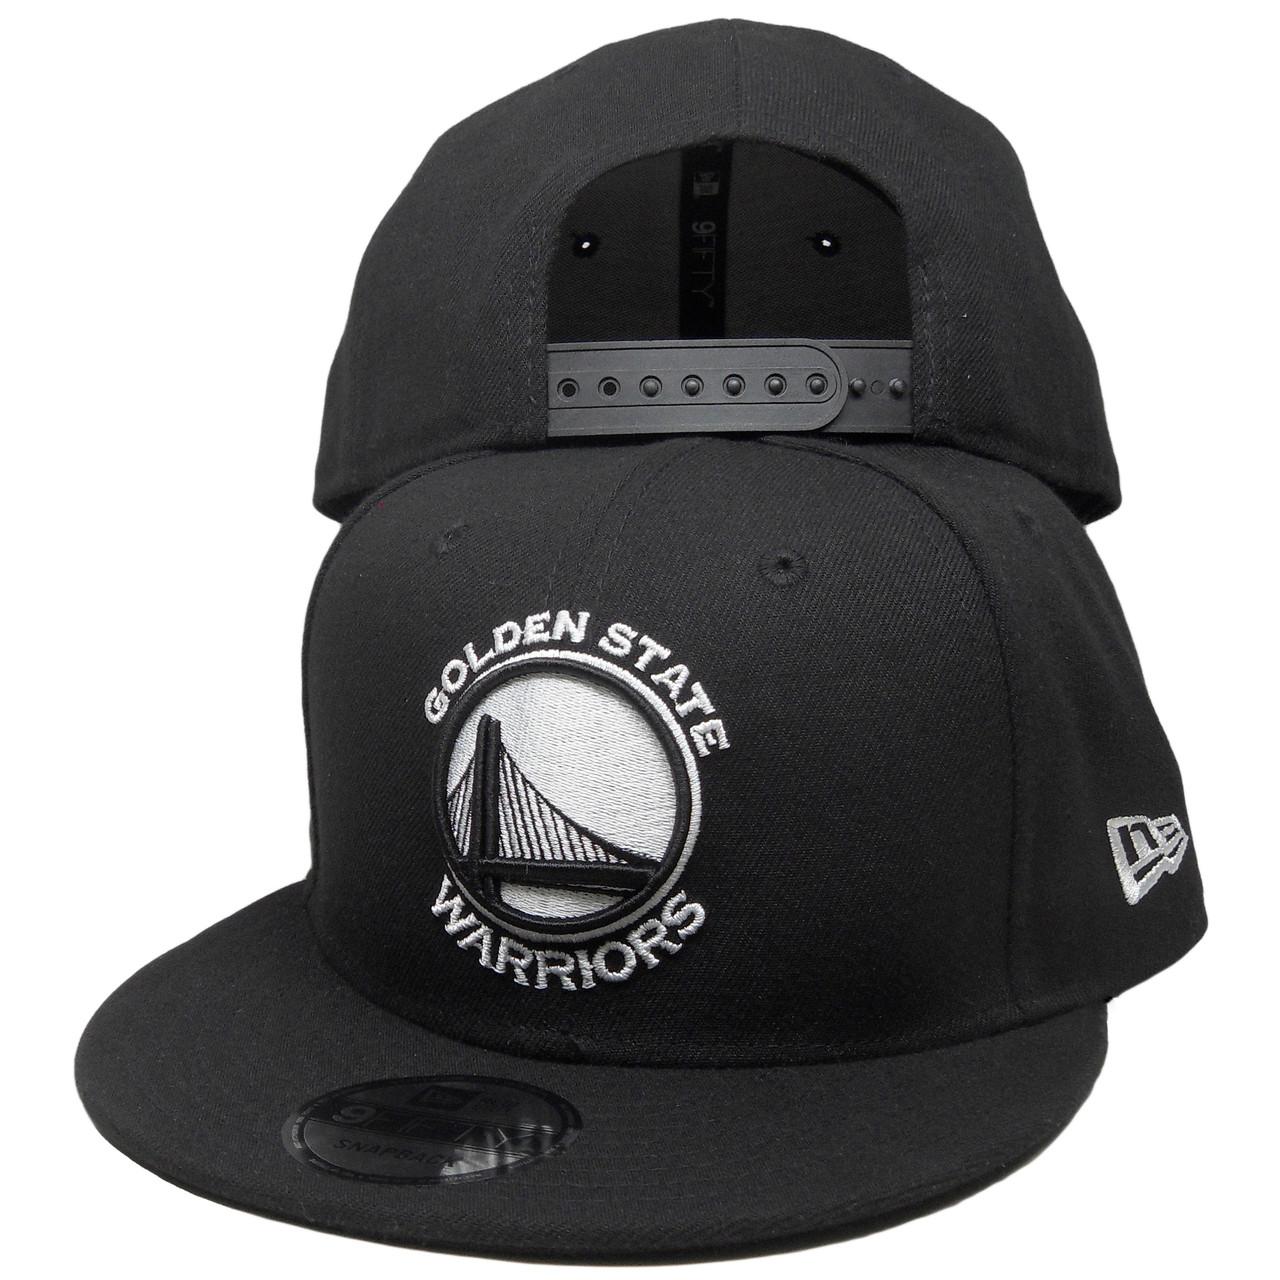 8b02e5e5142 Golden State Warriors New Era Basic 9Fifty Snapback - Black